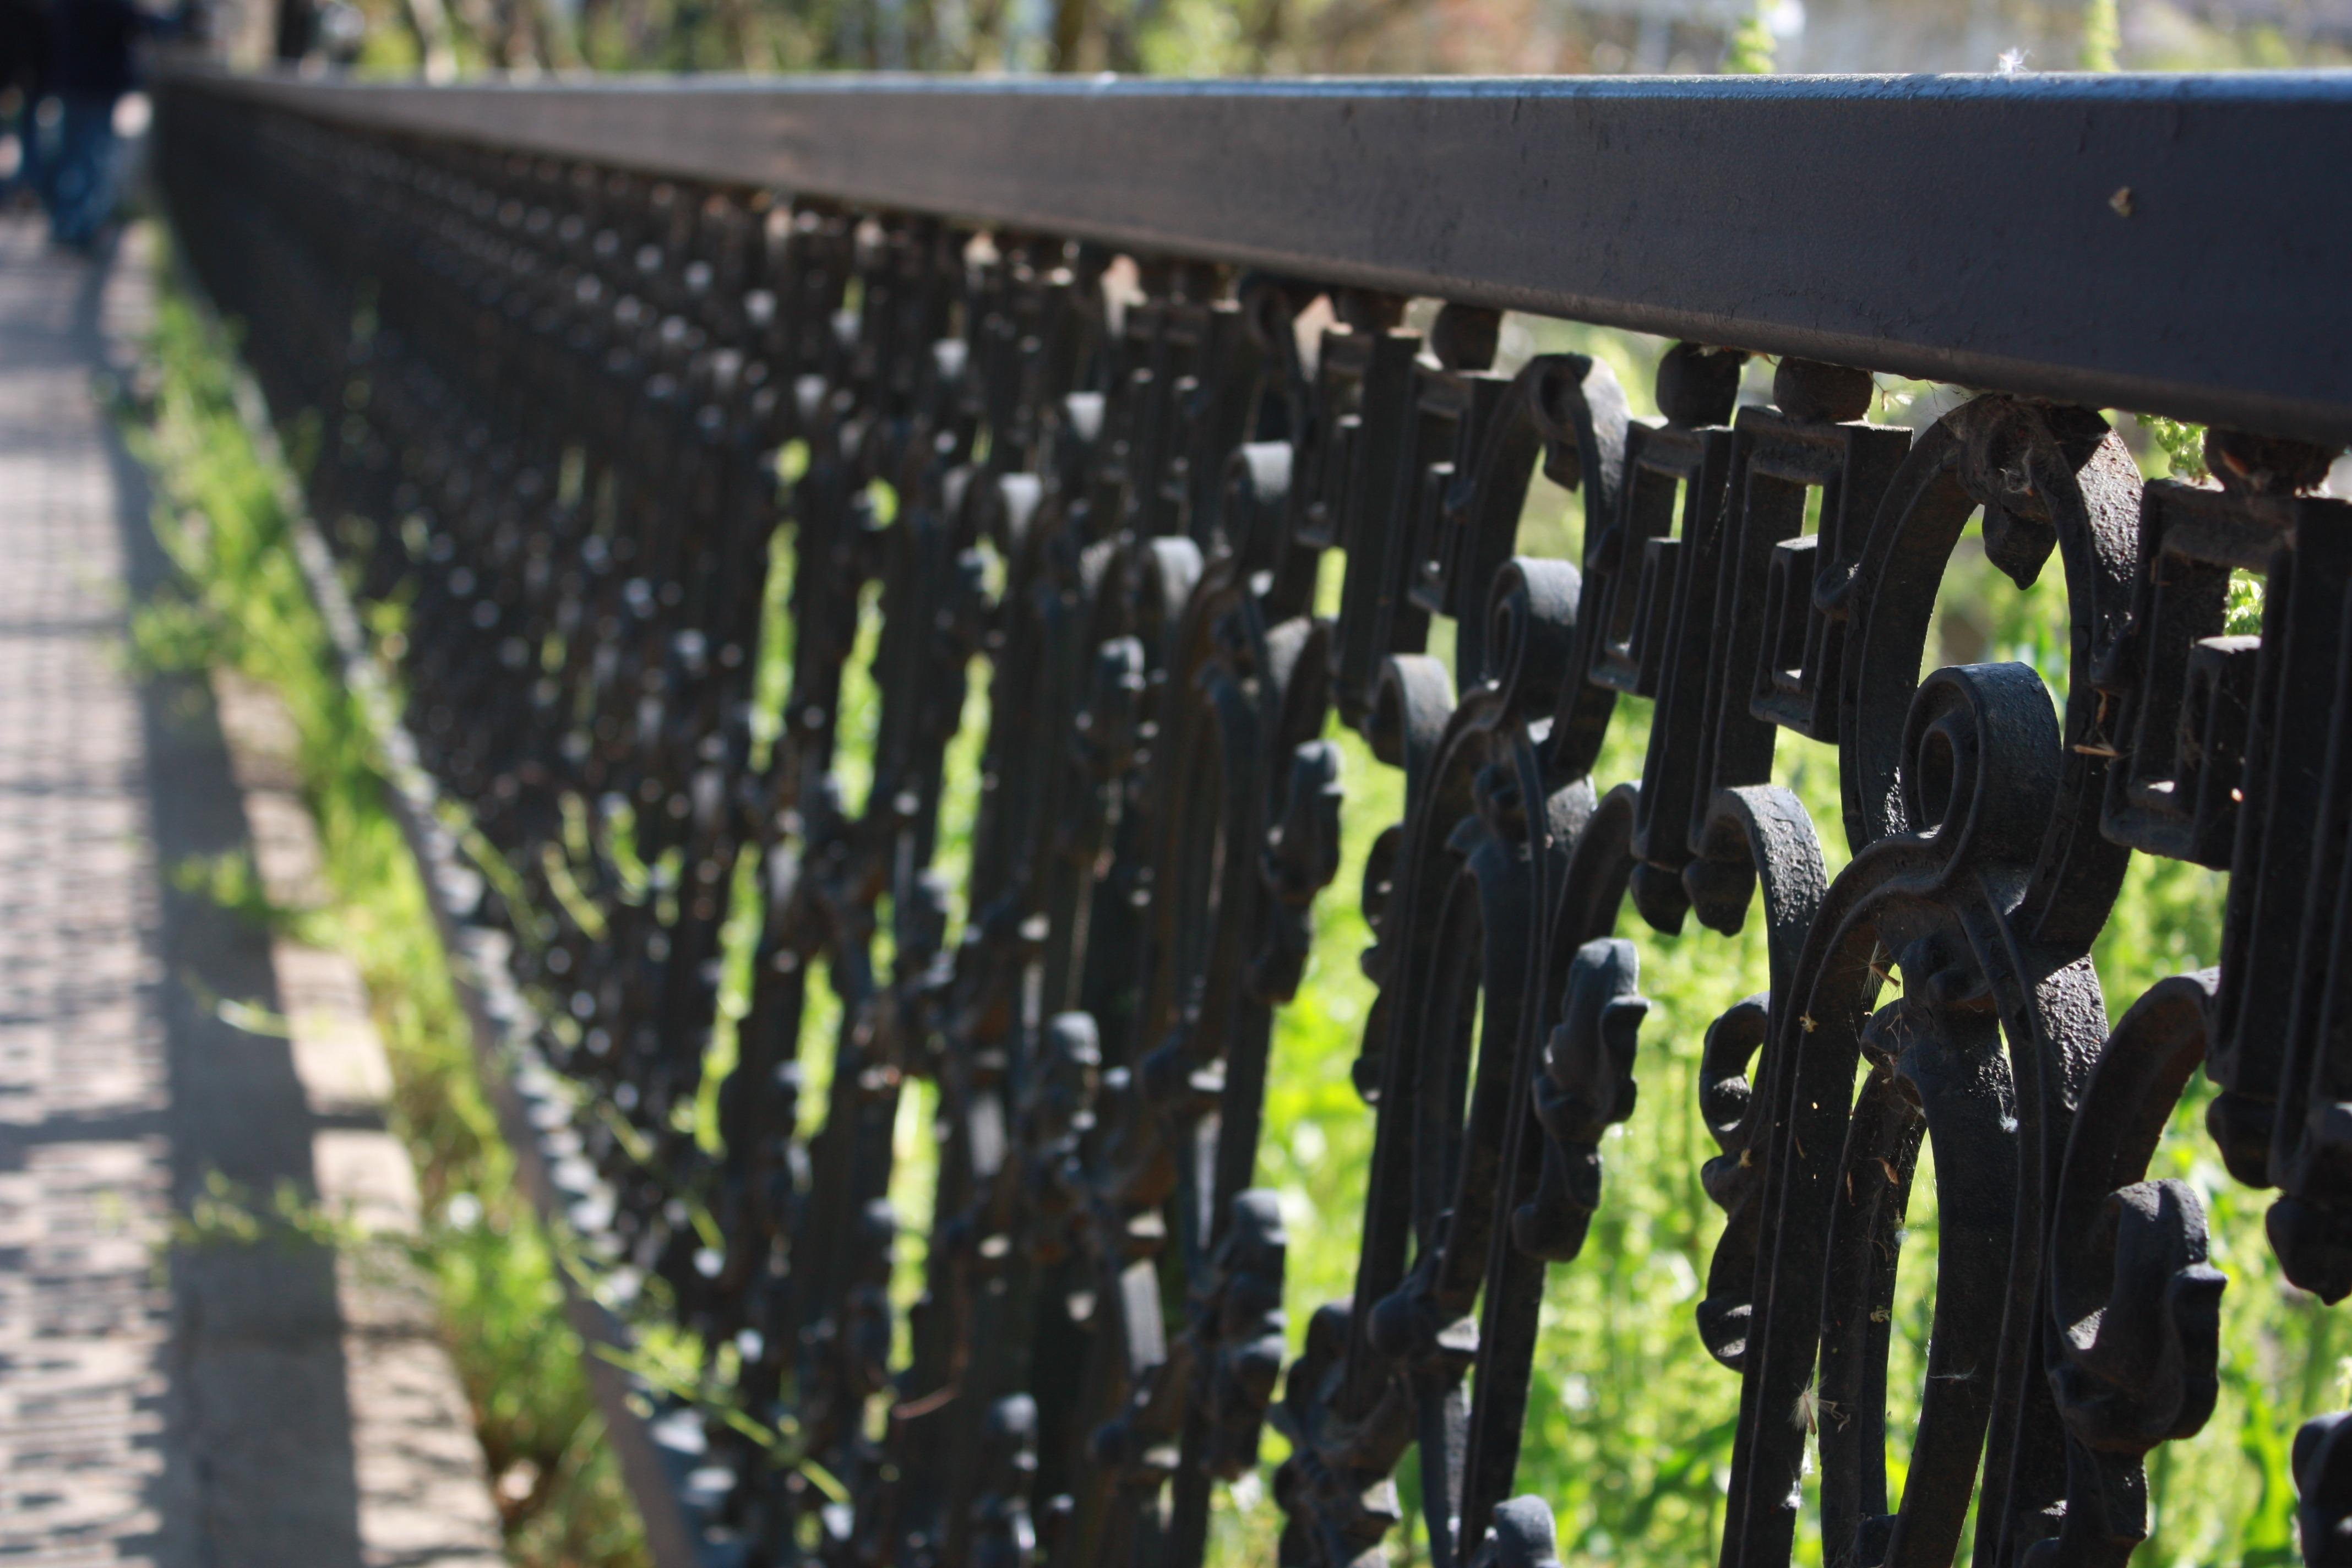 free images grass fence antique leaf steel green metal